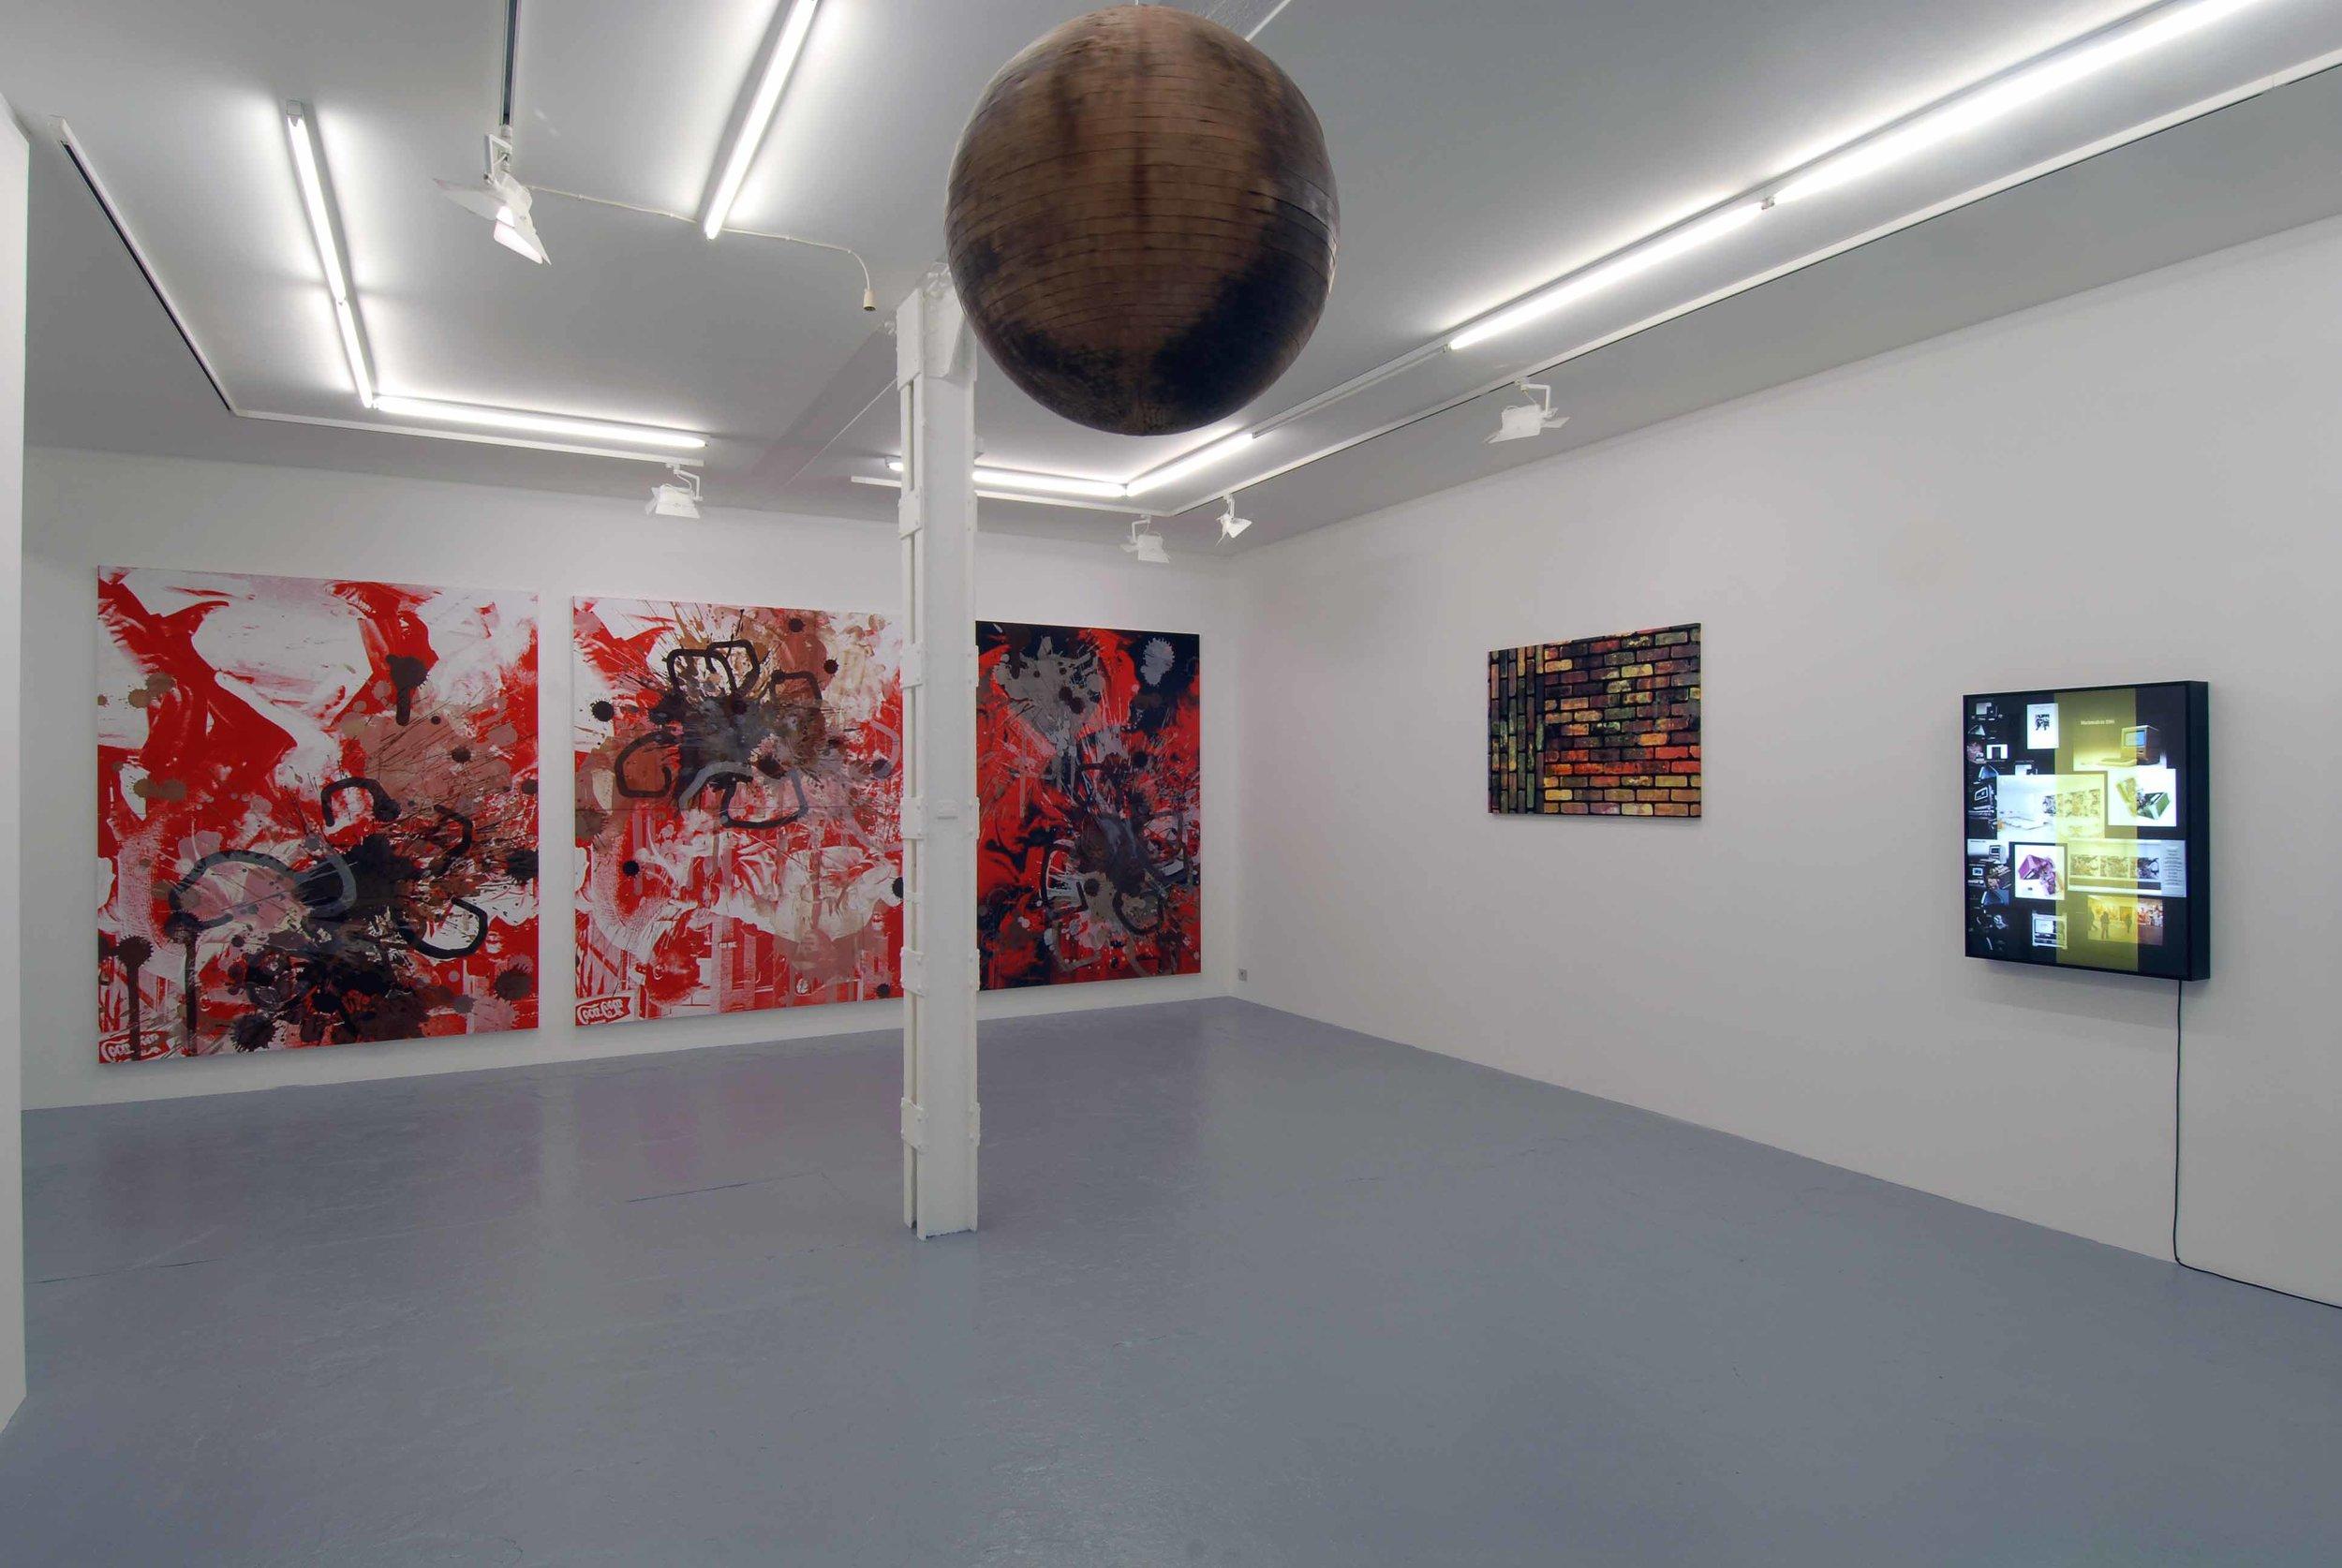 Kelley Walker, Catherine bastide gallery, Brussels, 2006, exhibition view